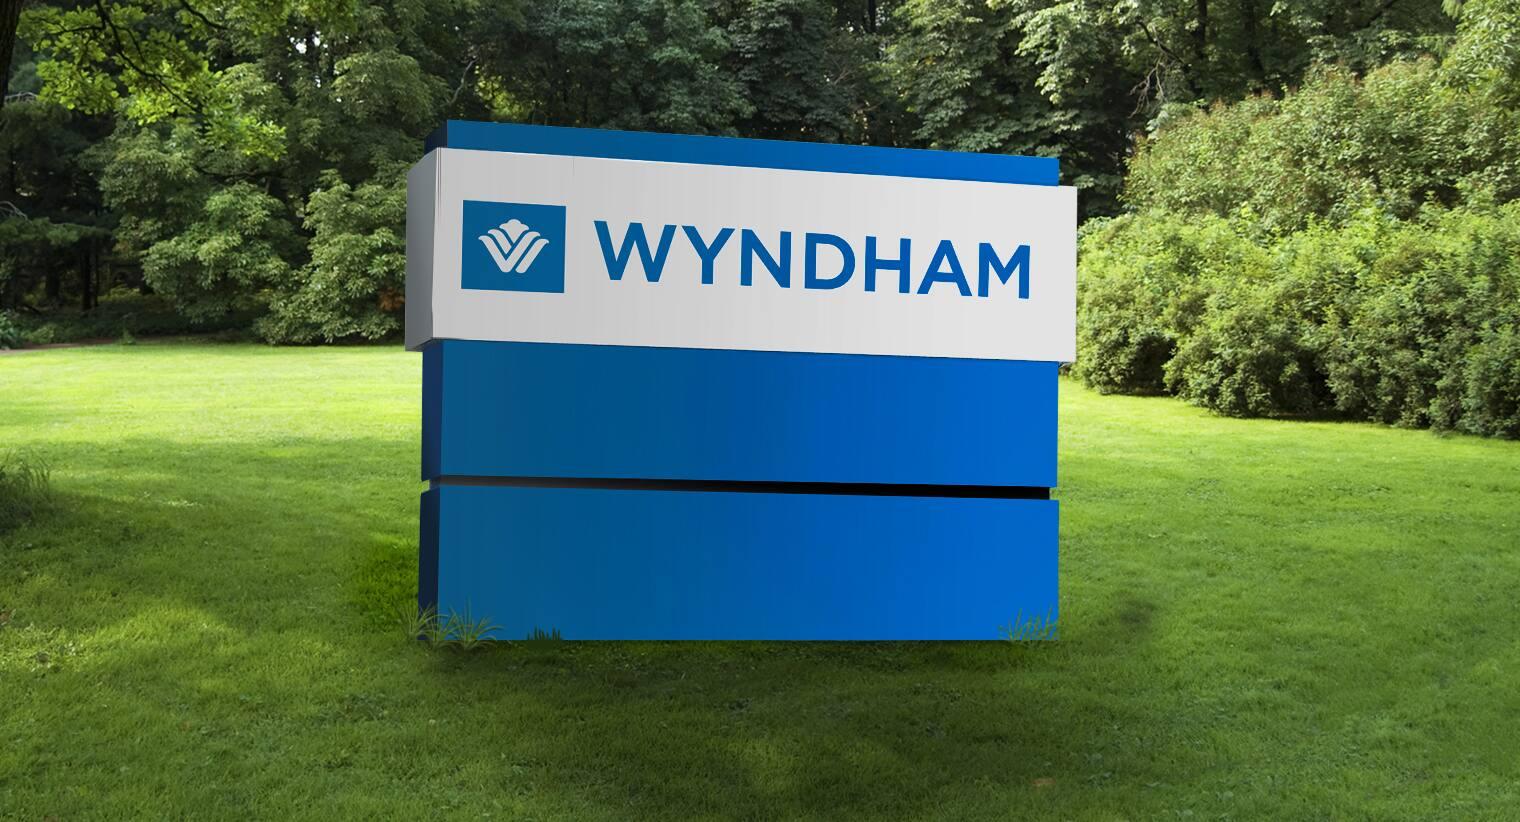 Wyndham Skylake Hà Nội 9